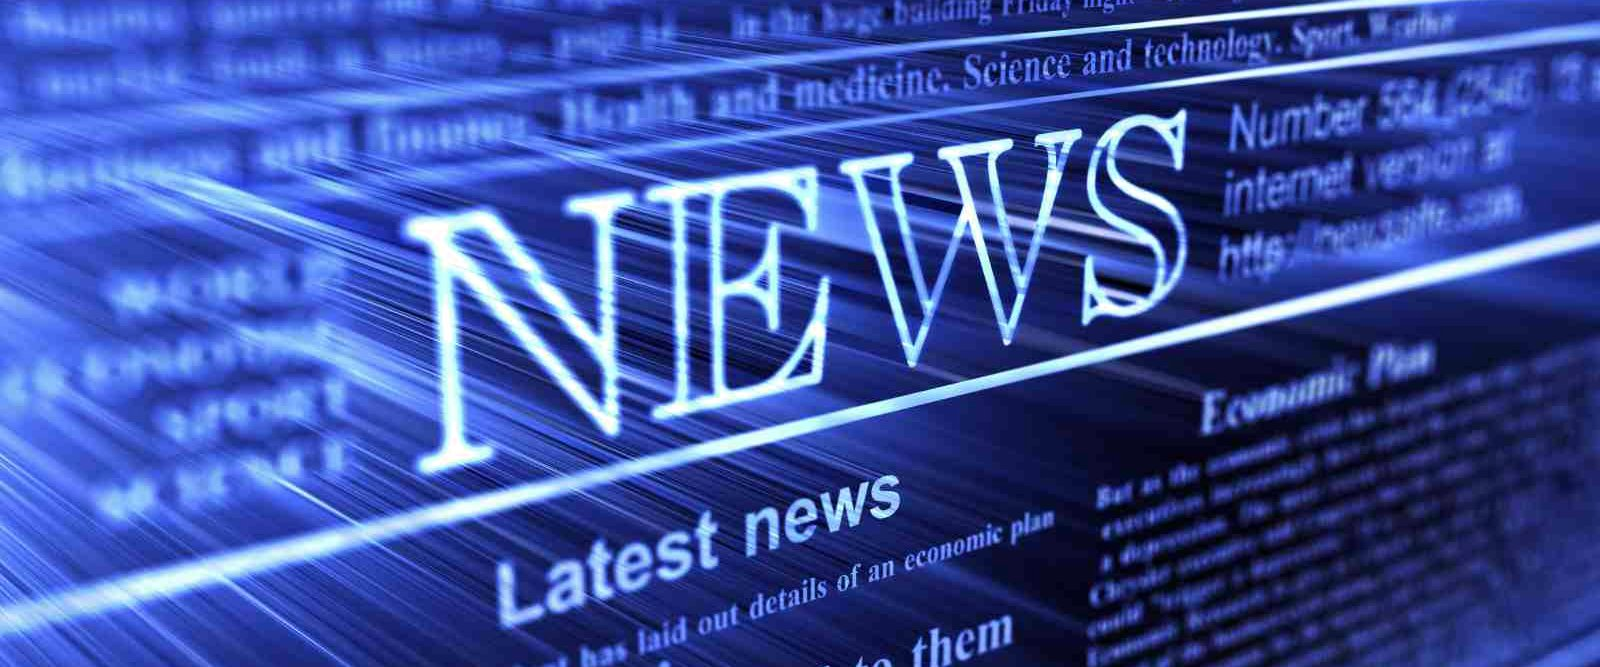 Kenya Holidays - News